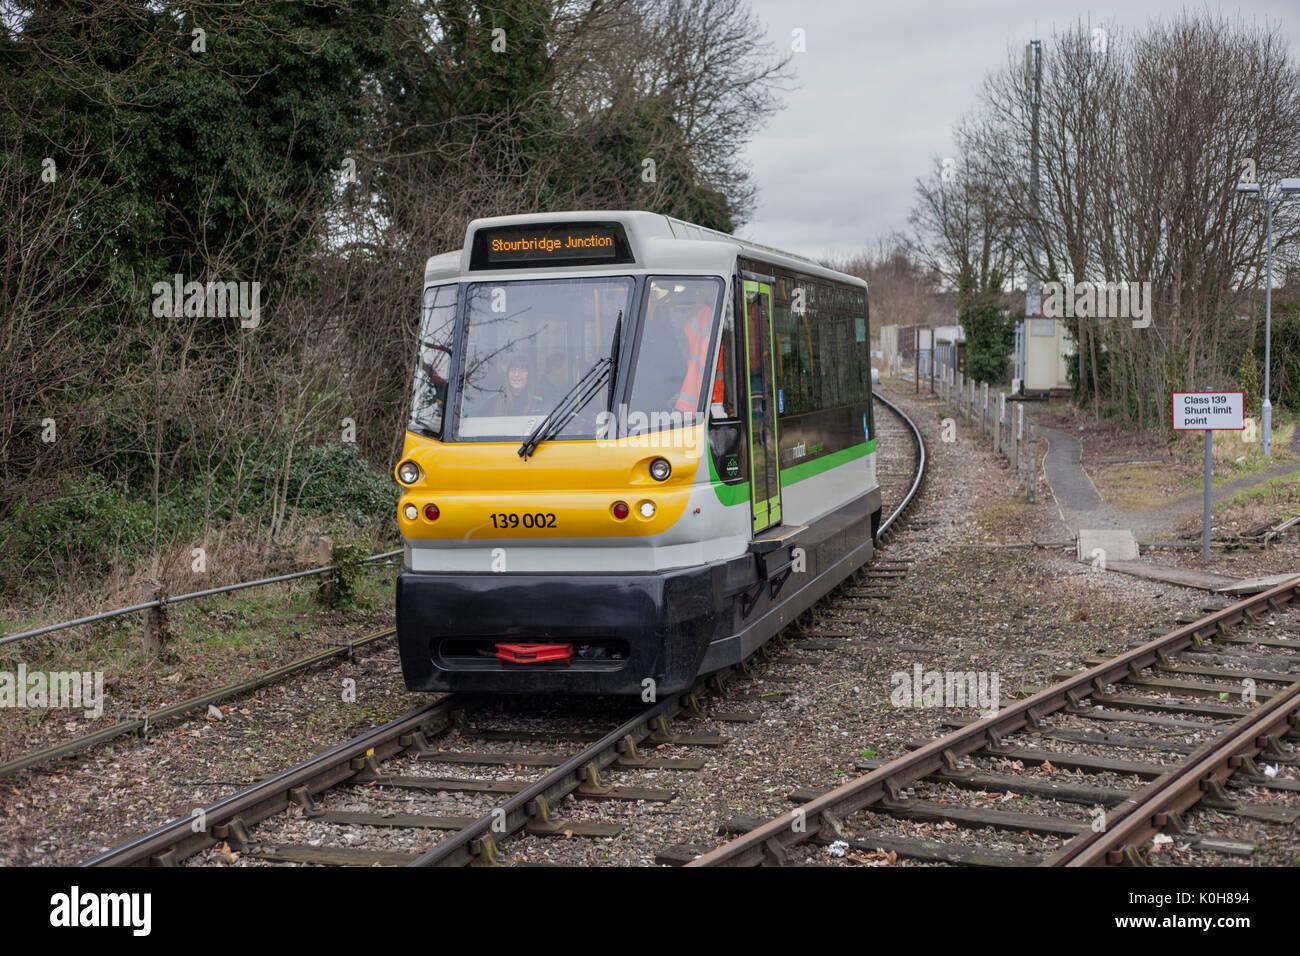 Parry people mover  139002 arrives at Stourbridge Junction with the 1030 Stourbridge Town - Stourbridge Jn - Stock Image